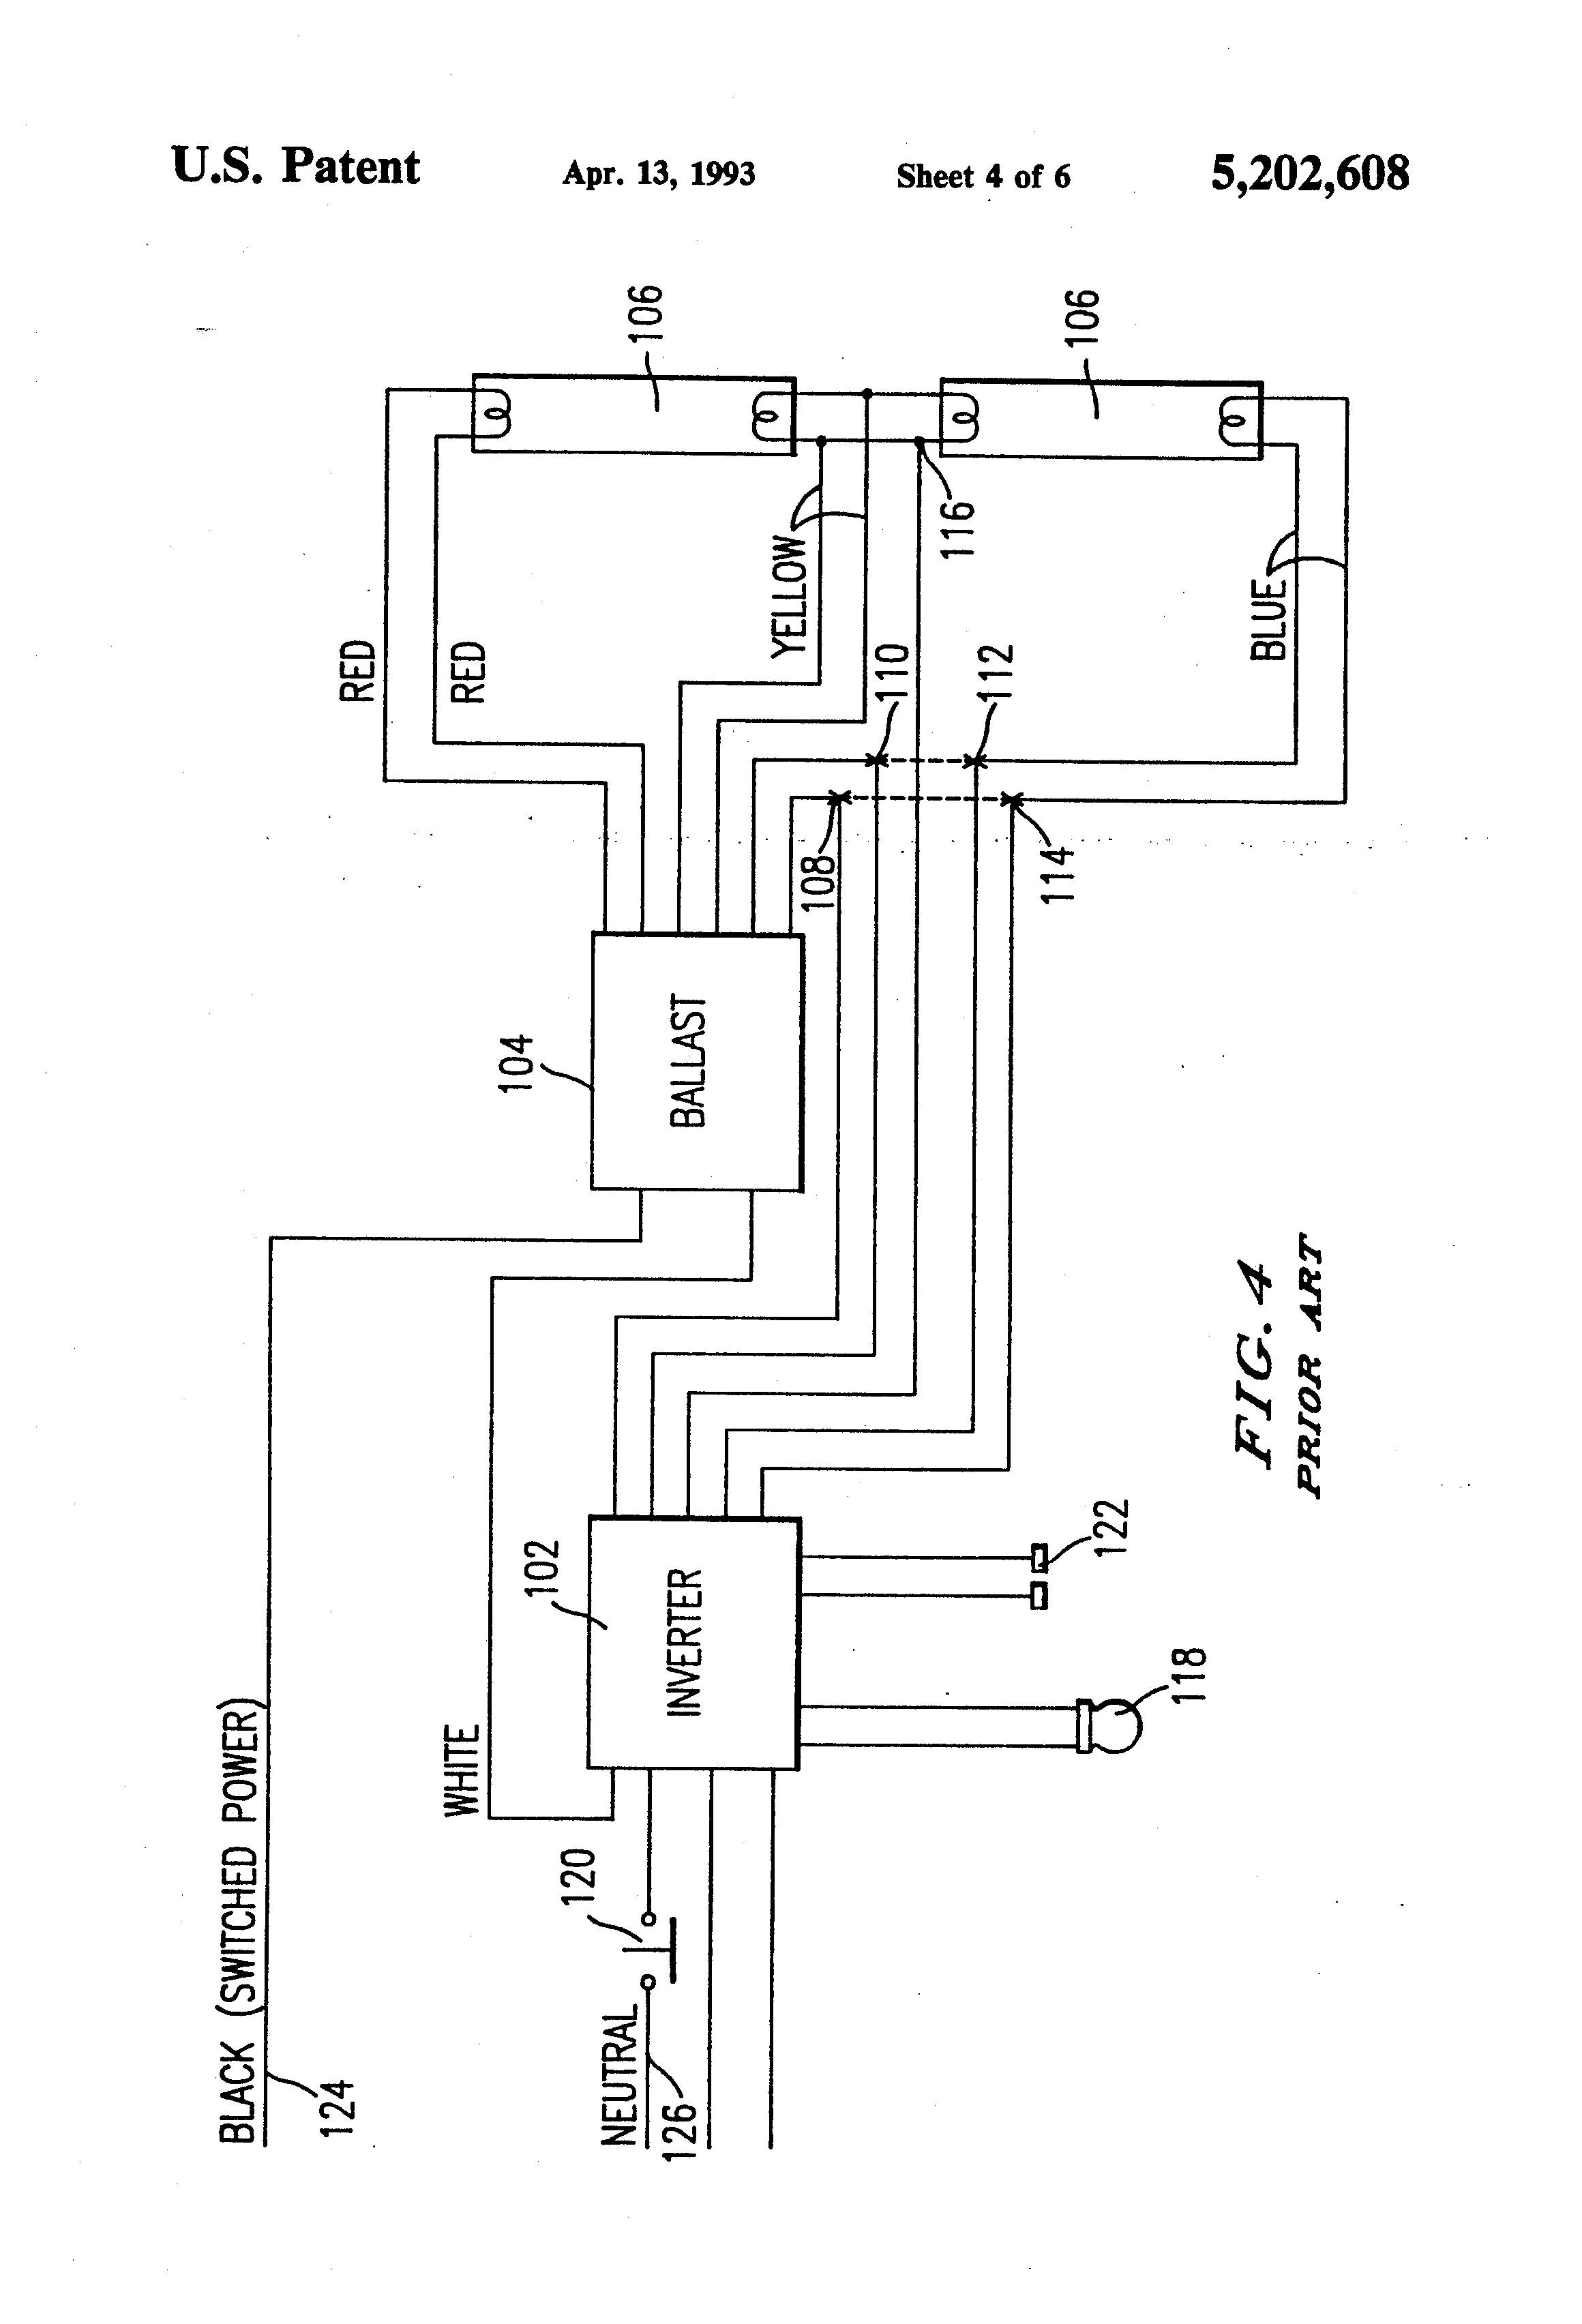 Holophane Light Wiring Diagrams - 220 Volt Contactor Wiring Diagram -  tomberlins.tukune.jeanjaures37.fr | Holophane Predator Light Wiring Diagram |  | Wiring Diagram Resource